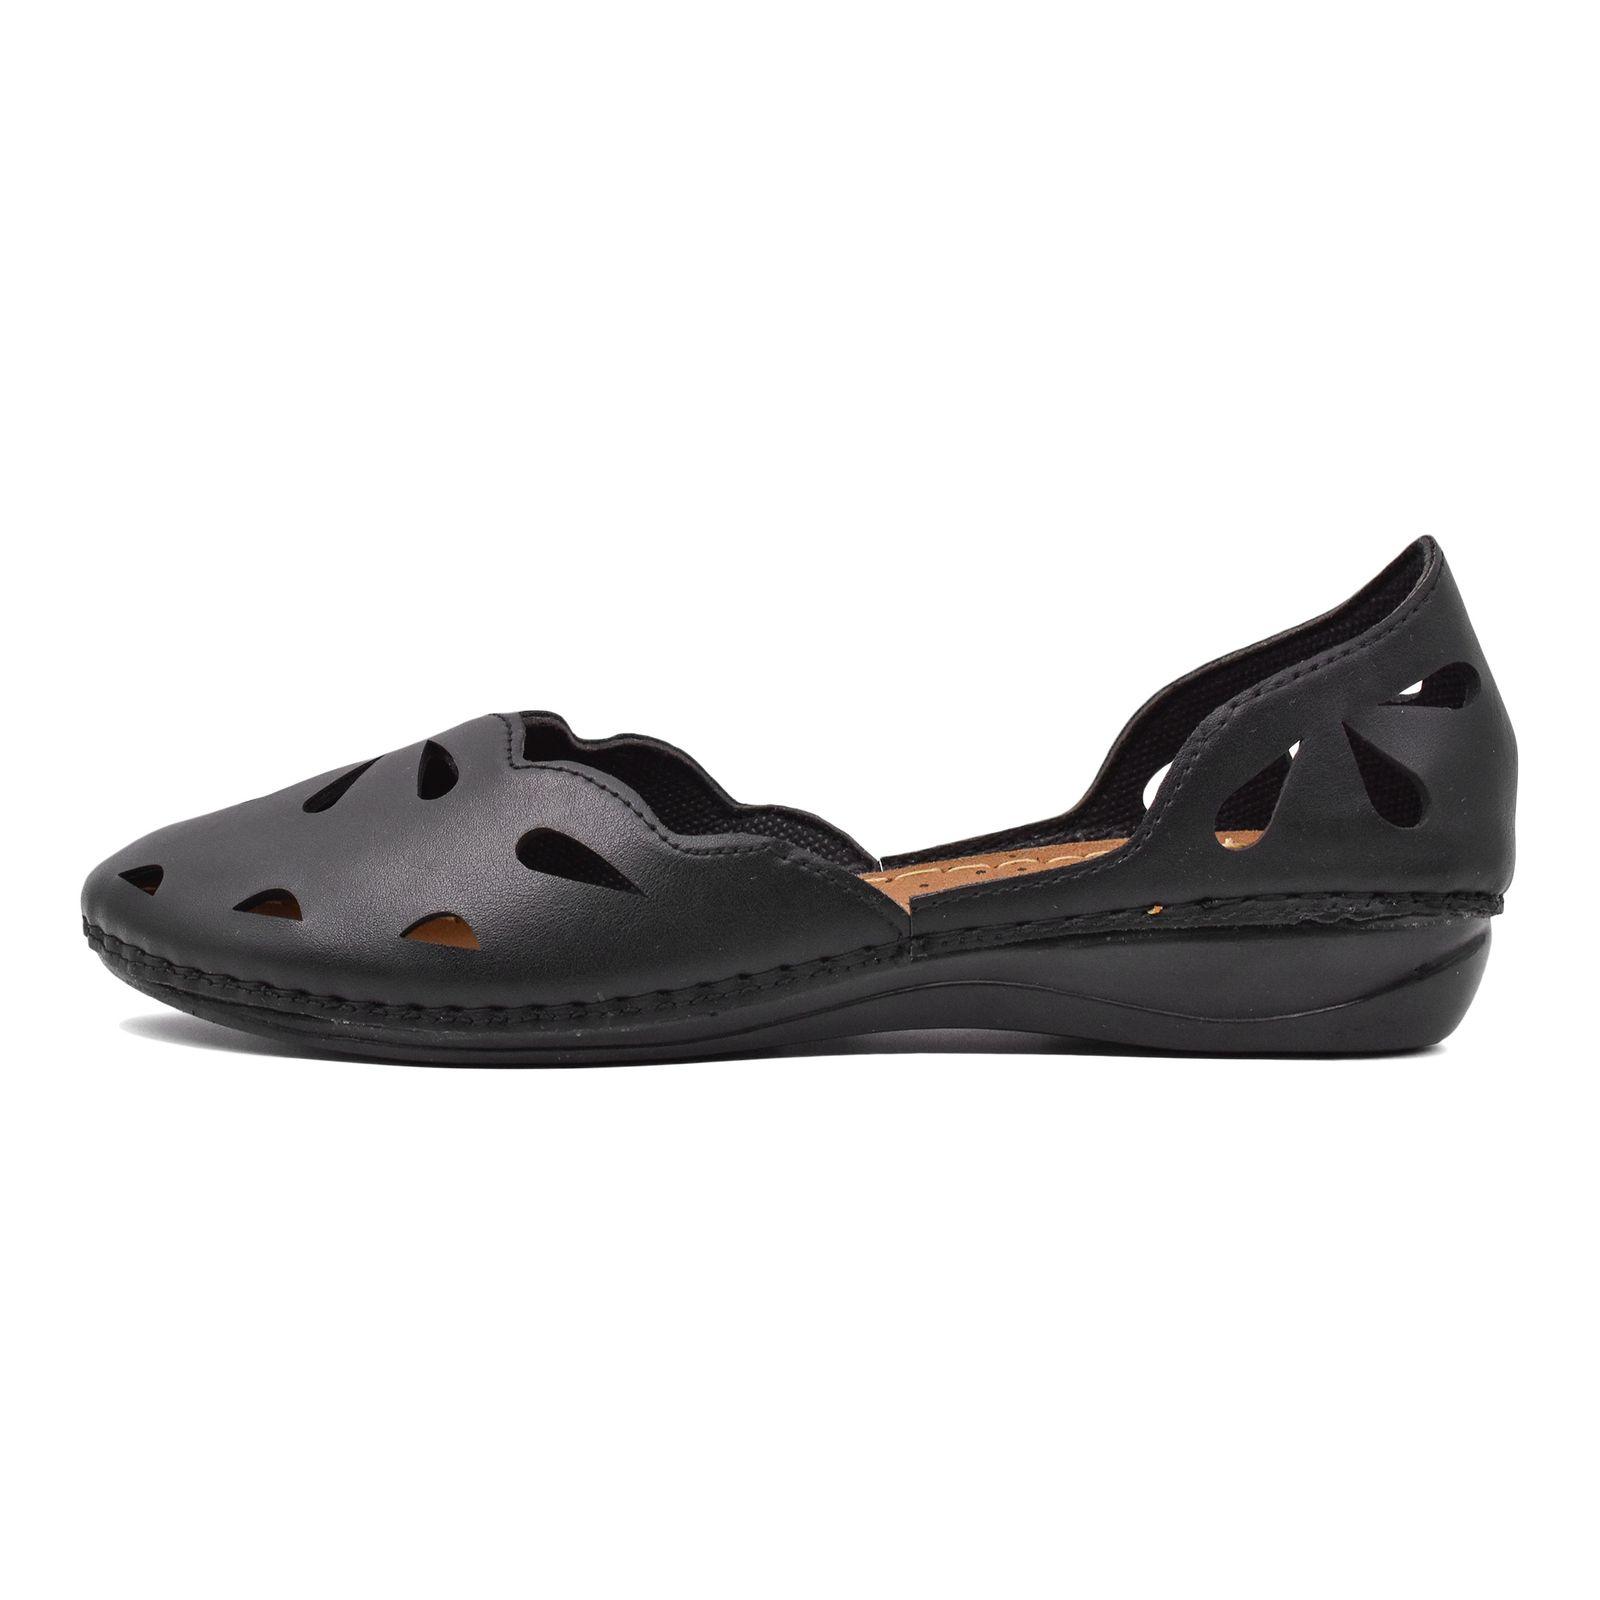 کفش زنانه شهپر مدل رویا 109 کد 7187 -  - 2